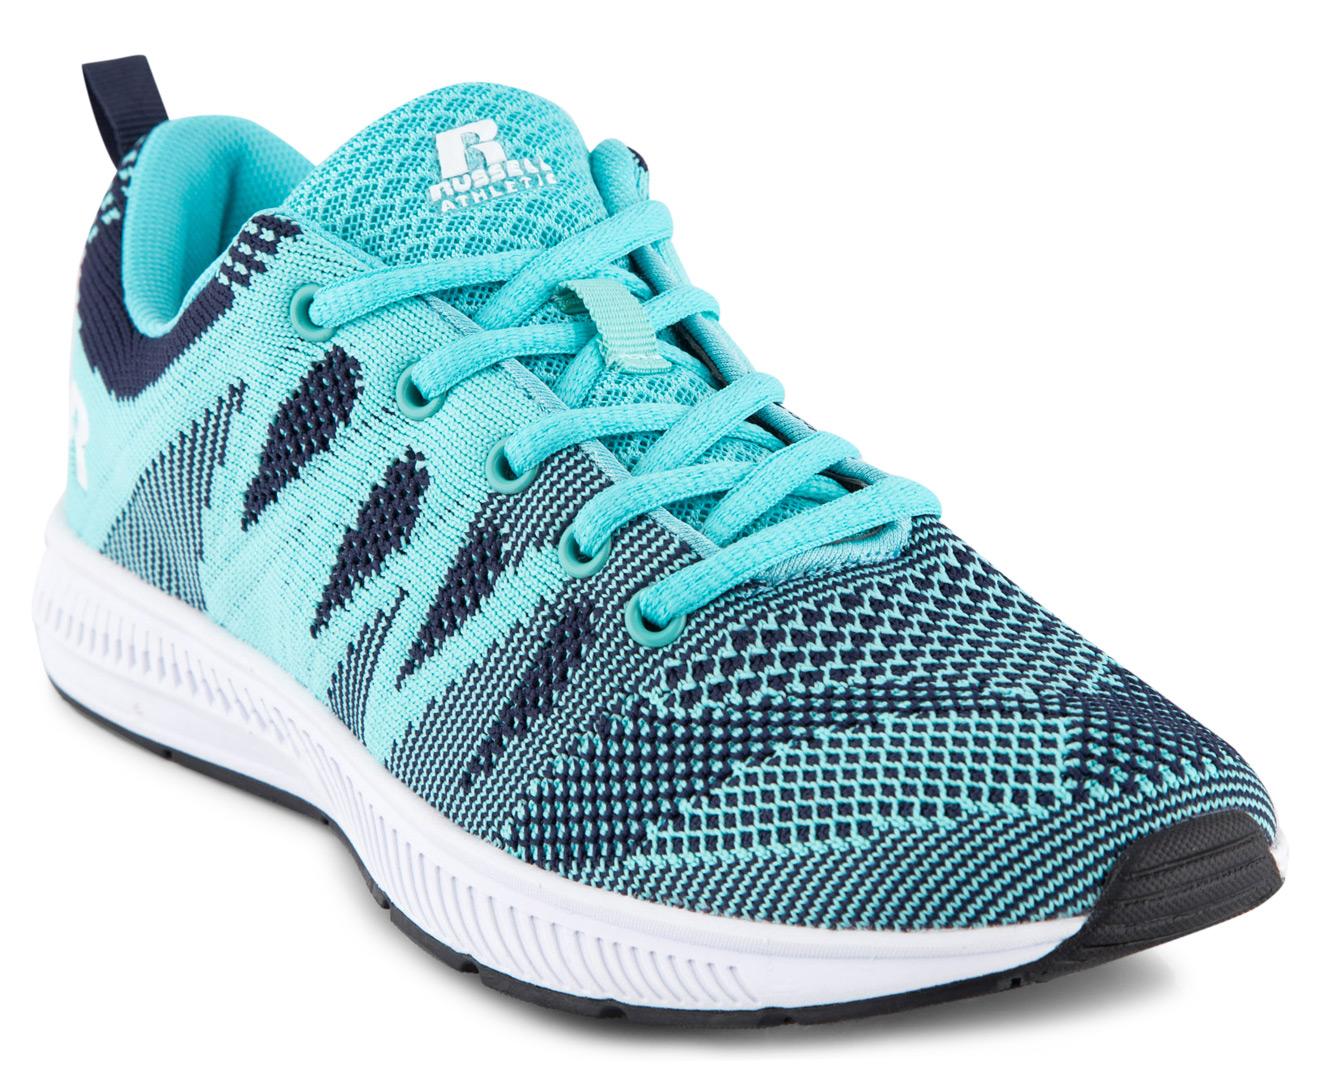 Russell Athletic Womenu0026#39;s Magni Shoe - Aqua/Navy | Great ...